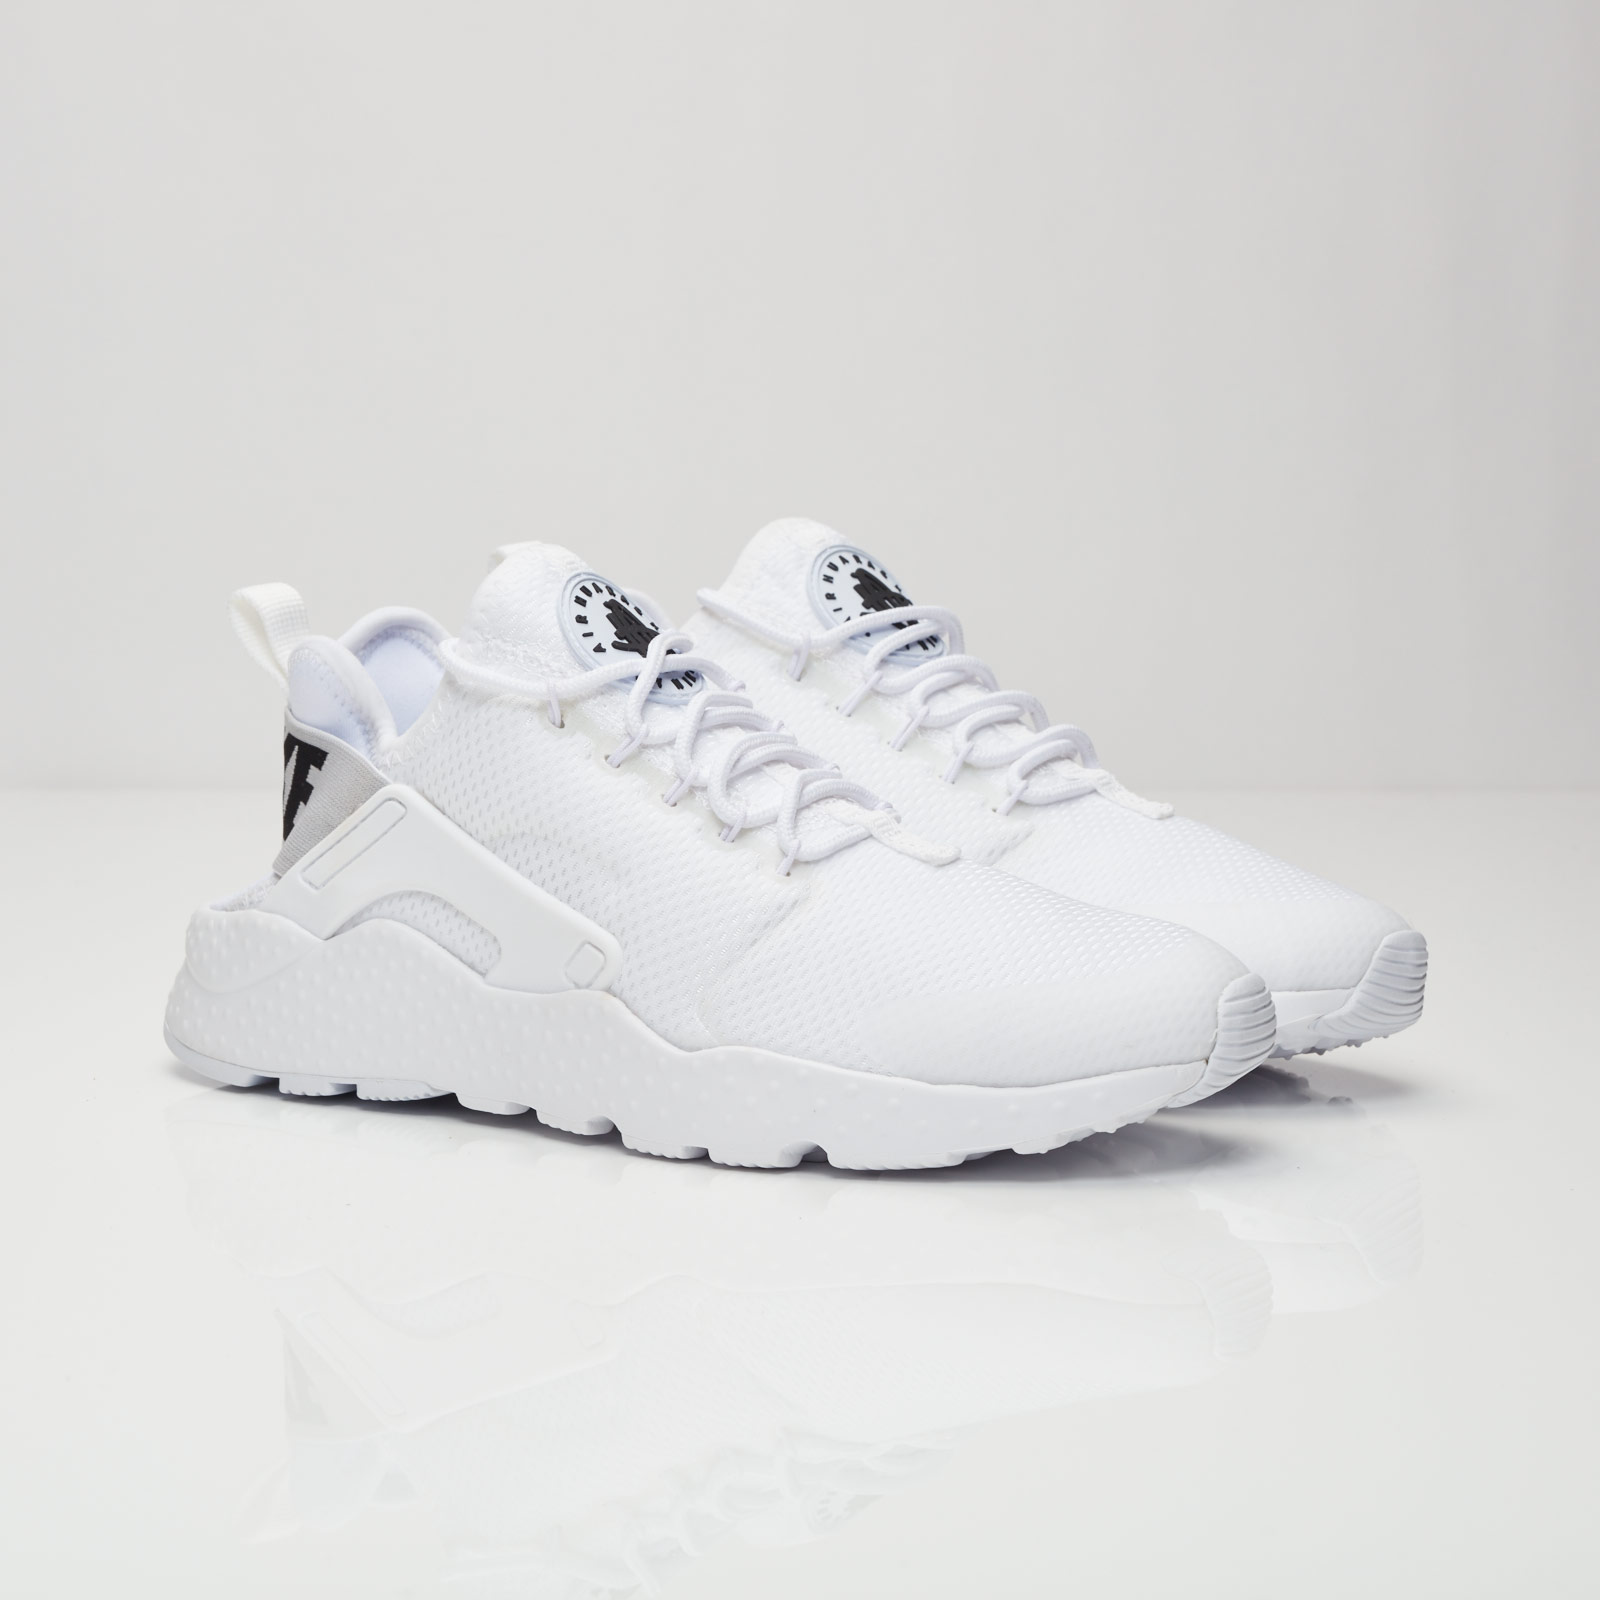 Nike Wmns Air Huarache Run Ultra 819151 101 Sneakersnstuff